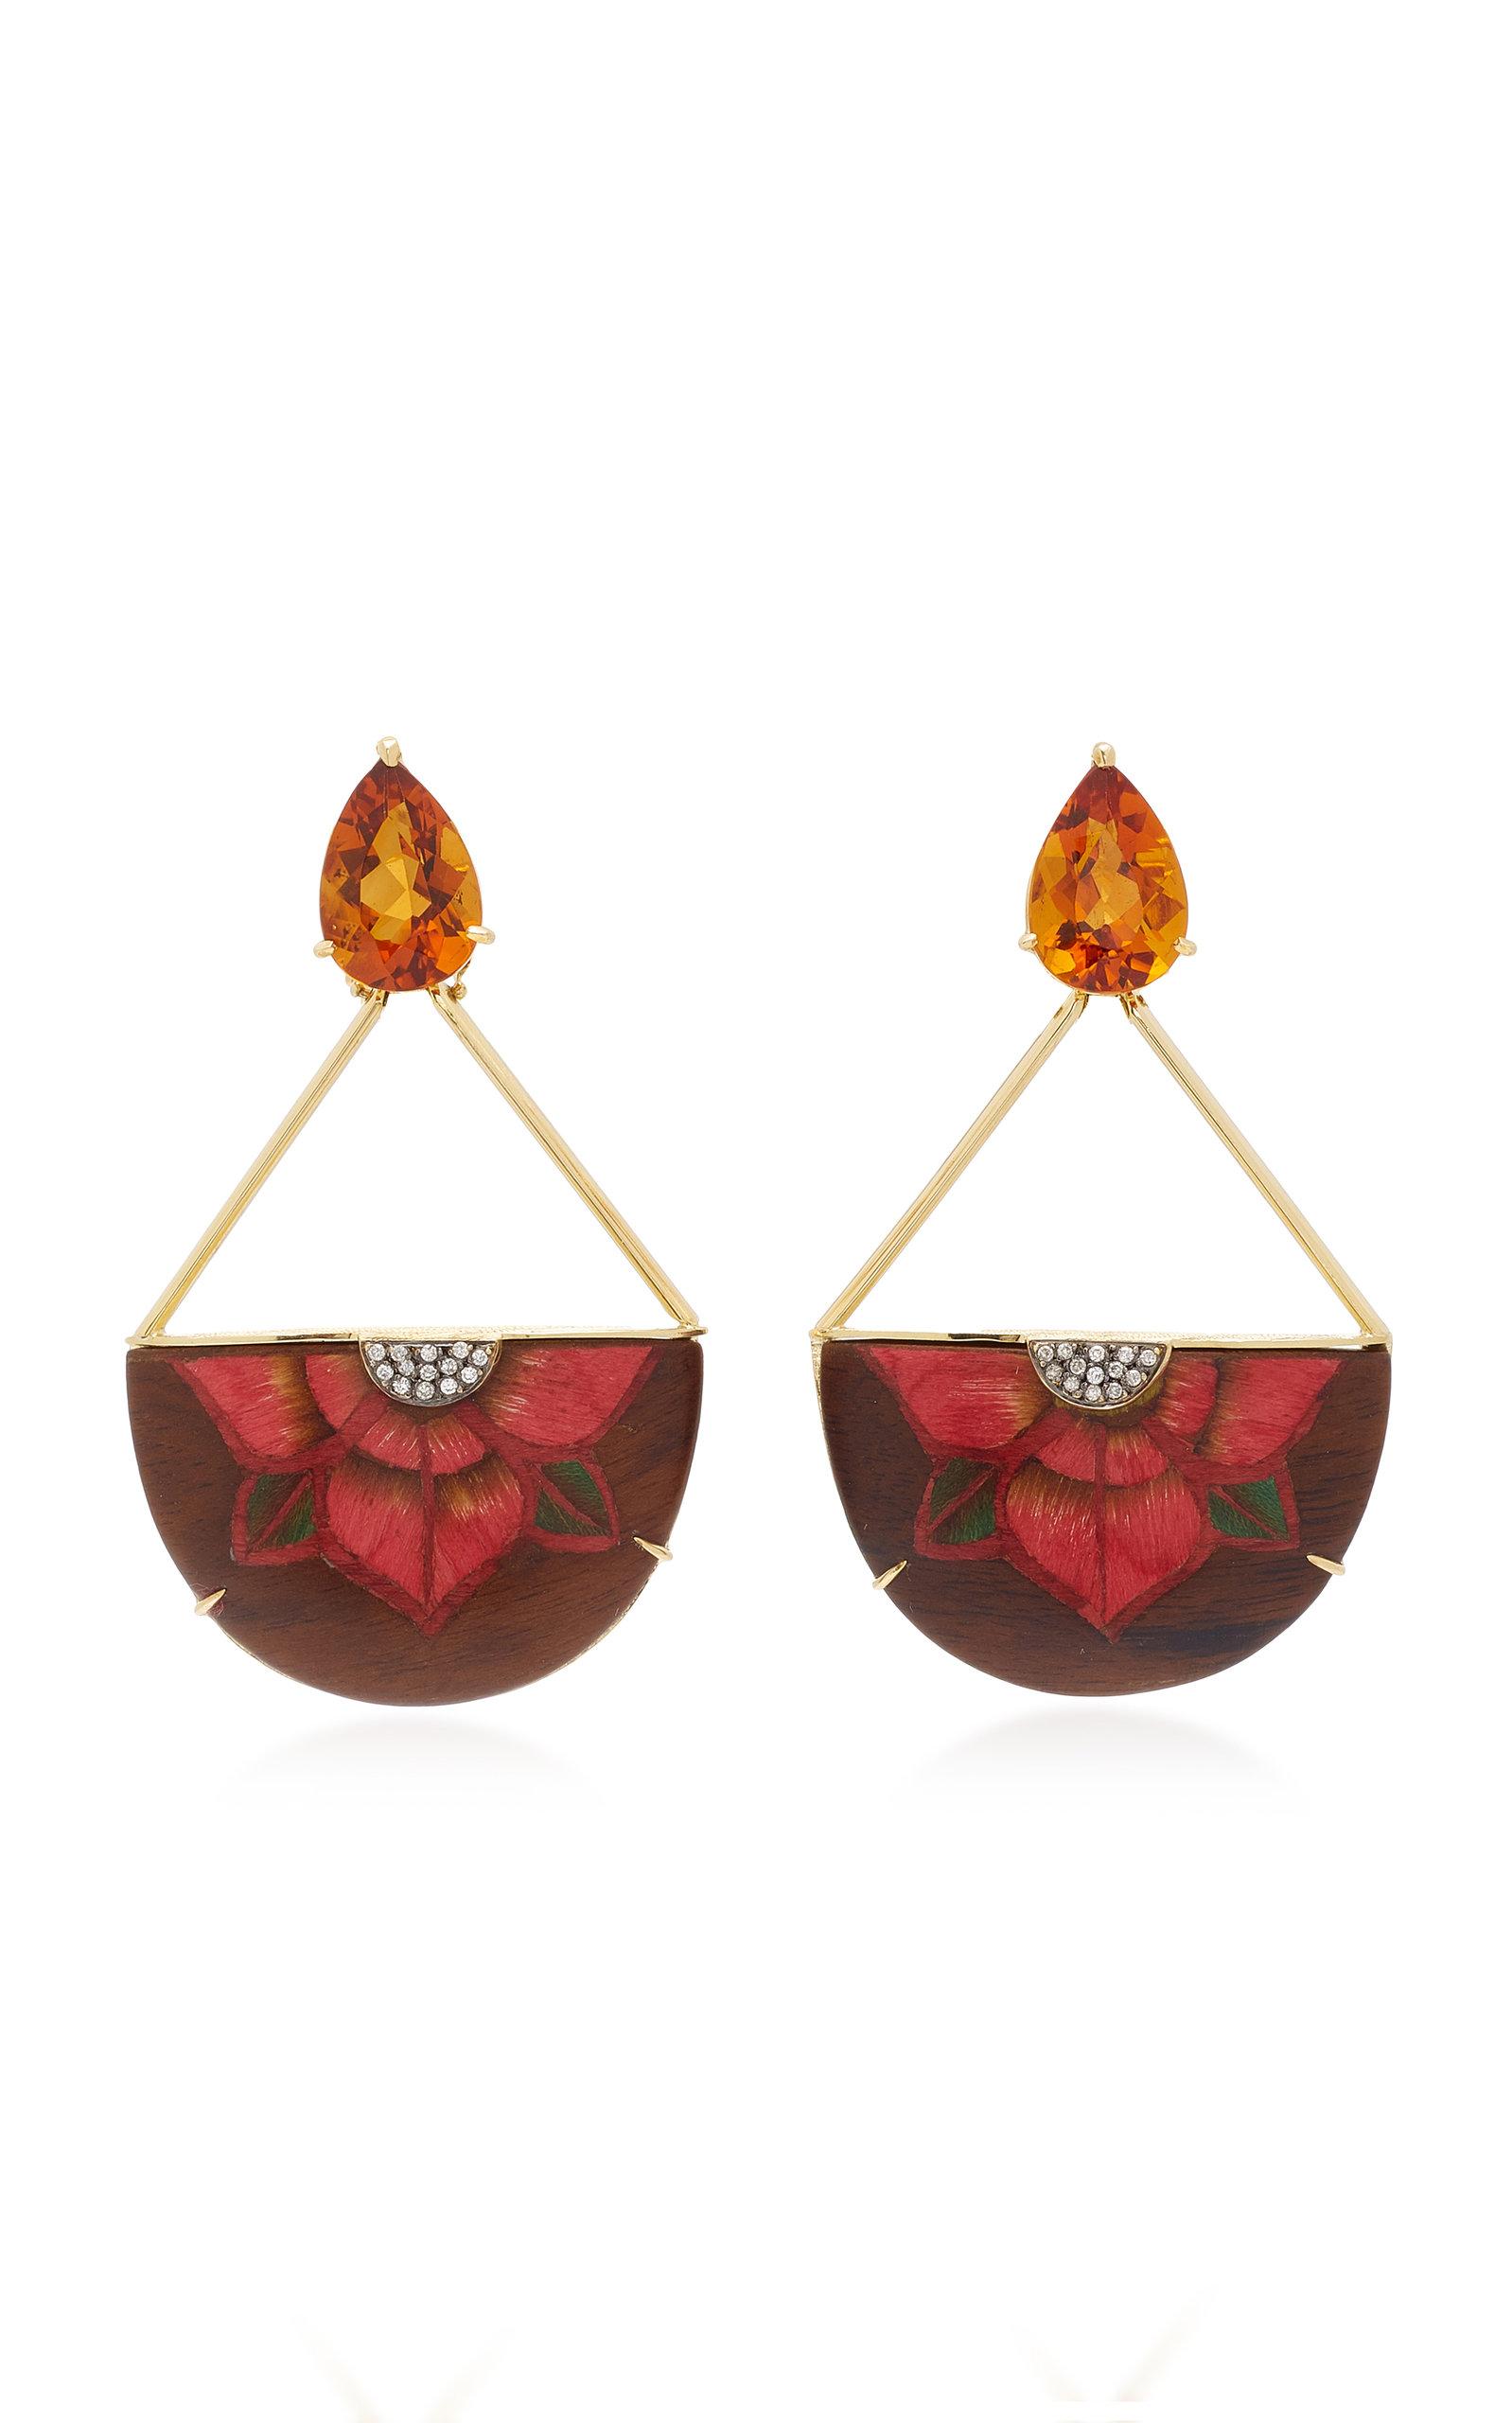 SILVIA FURMANOVICH 18K Gold Resin Citrine And Diamond Earrings in Red